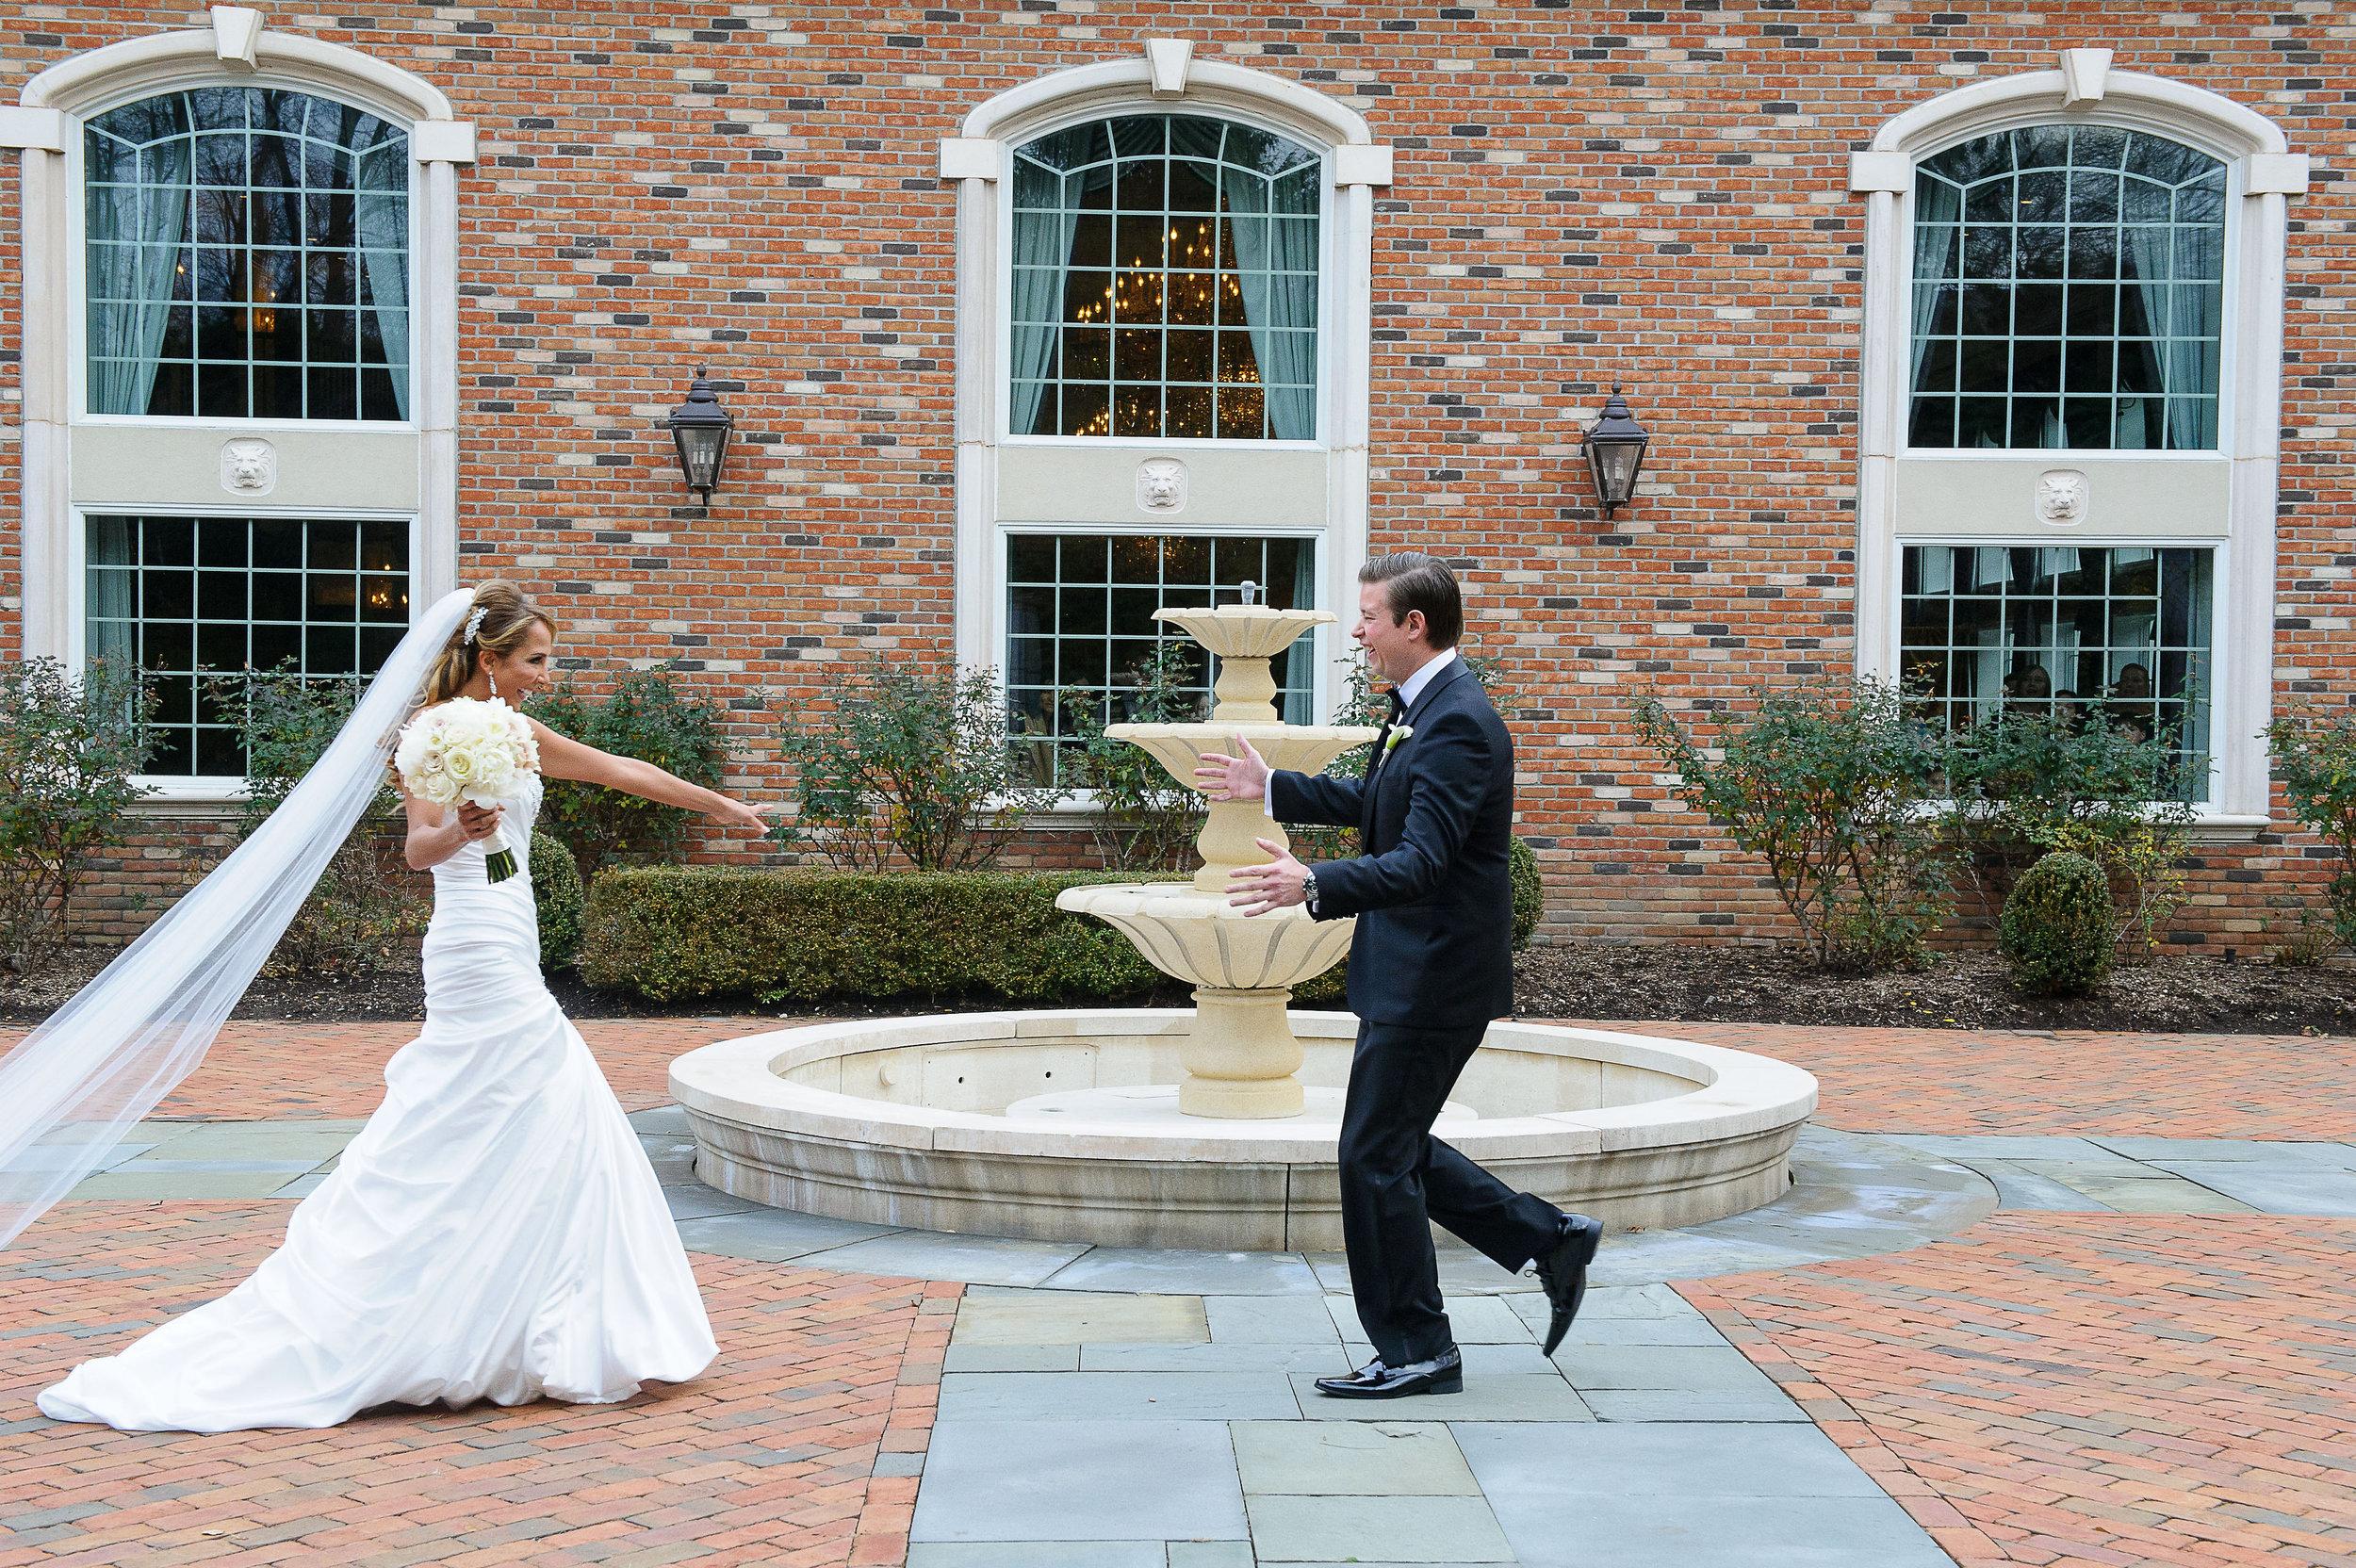 Ceci_New_York_Custom_Invitation_ New_Jersey_Wedding_Luxury_Personalized_Ceci_Style_Bride_Foil_Stamping92.JPG